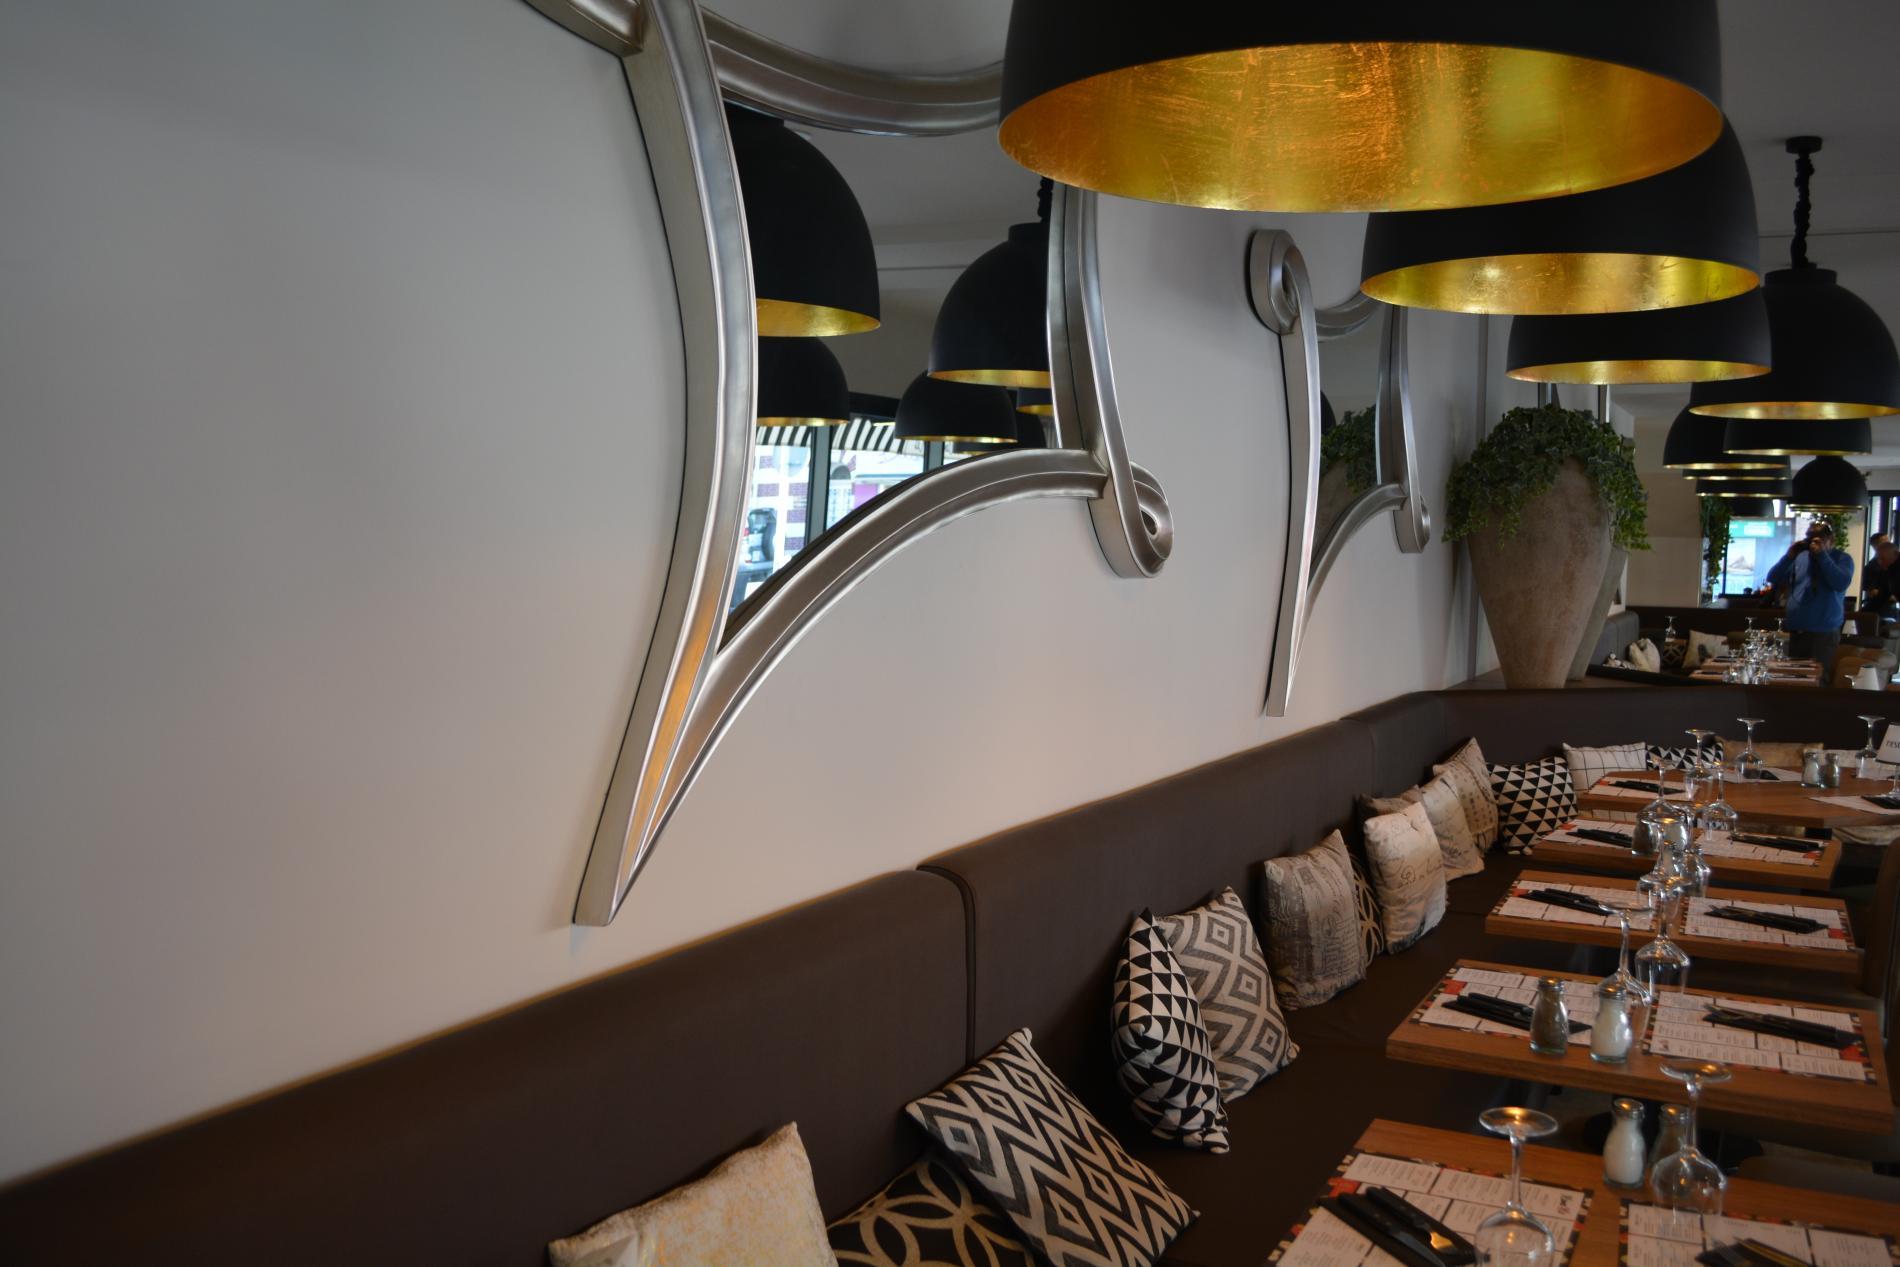 Restaurant - Pizzeria - Mamma Mia - Ouistreham